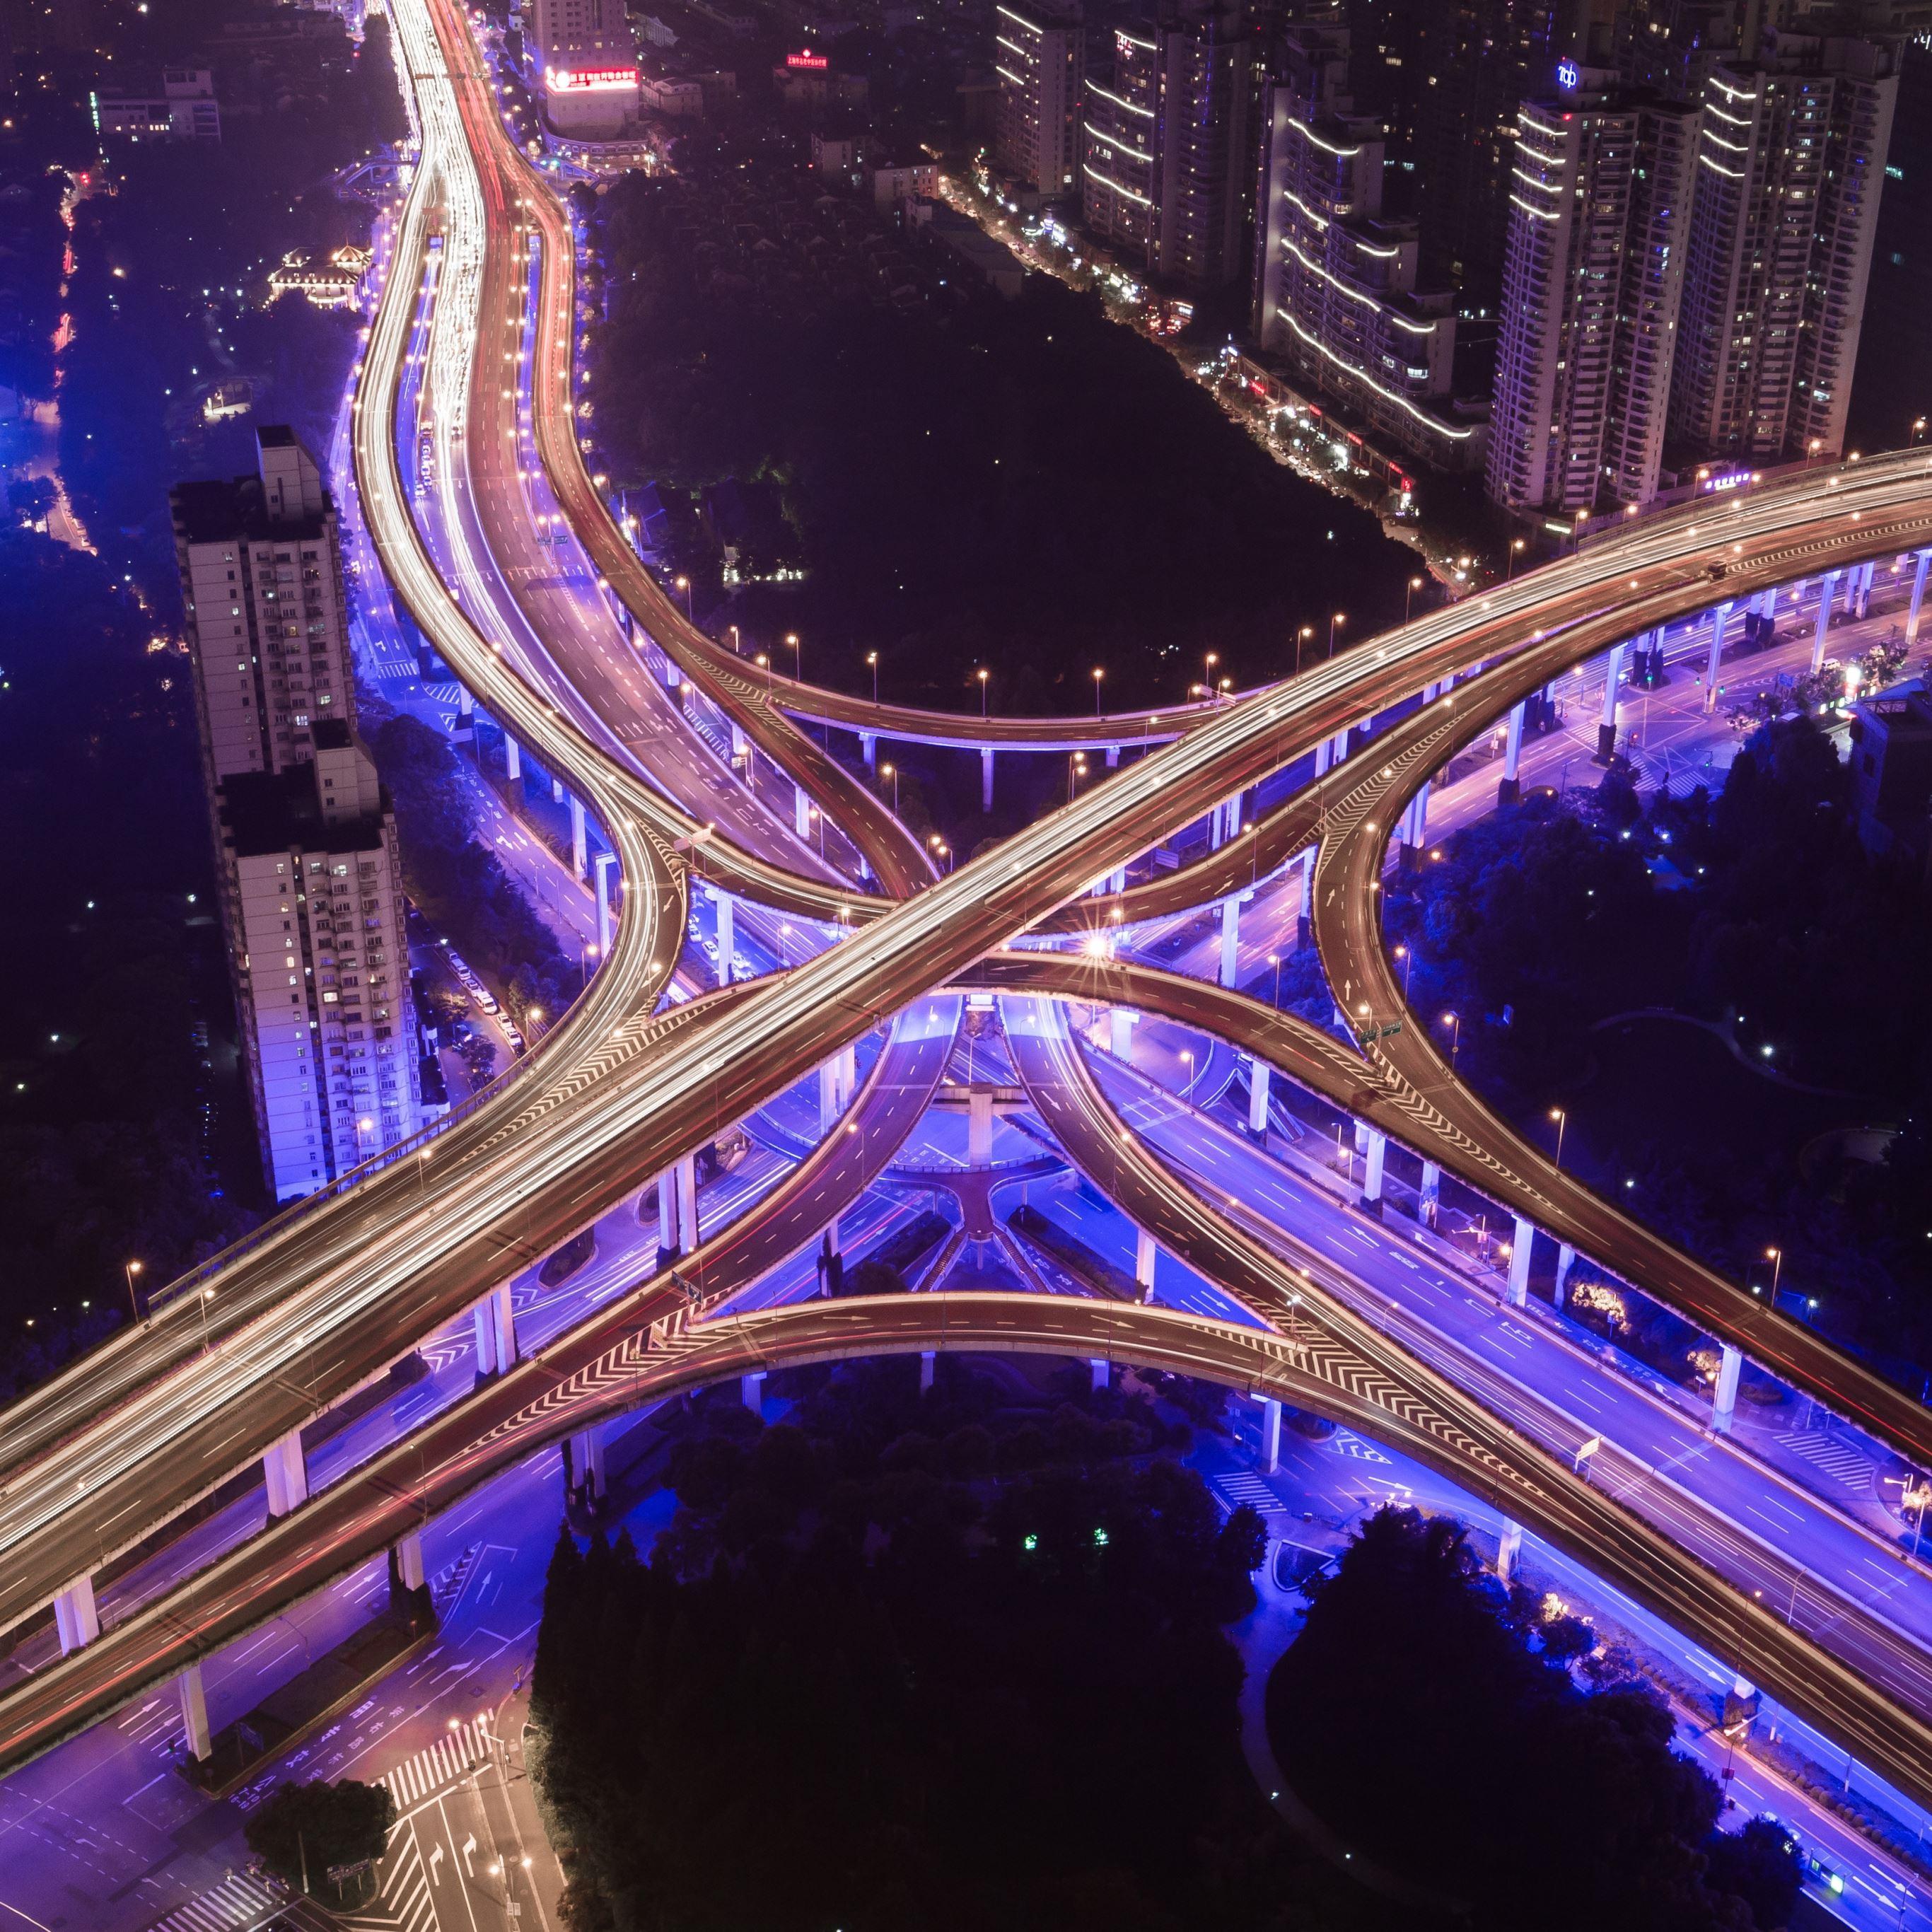 Road night city light iPad Pro wallpaper